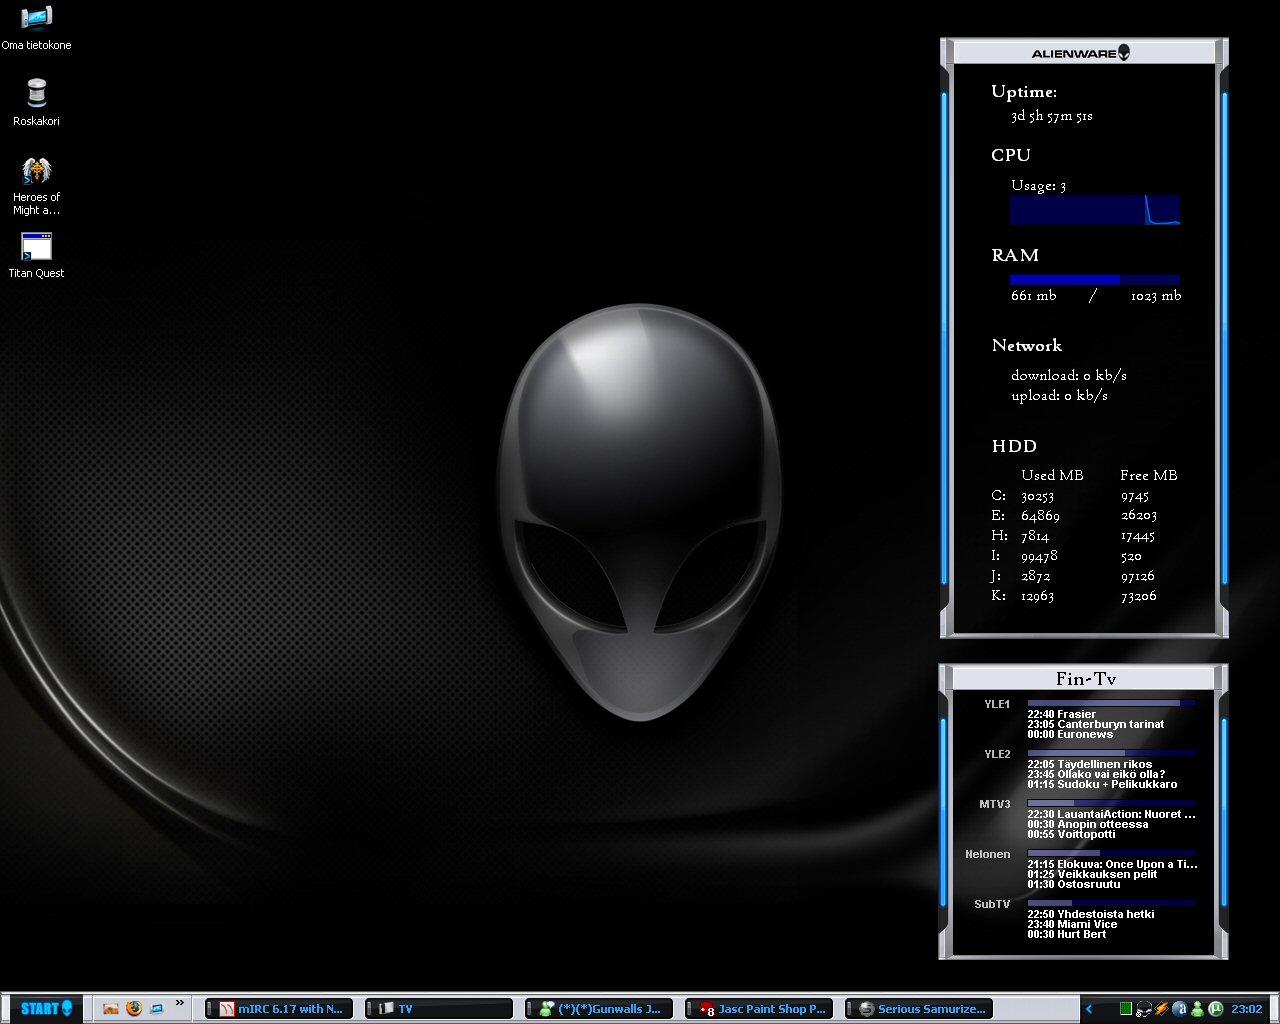 Title: Alienware